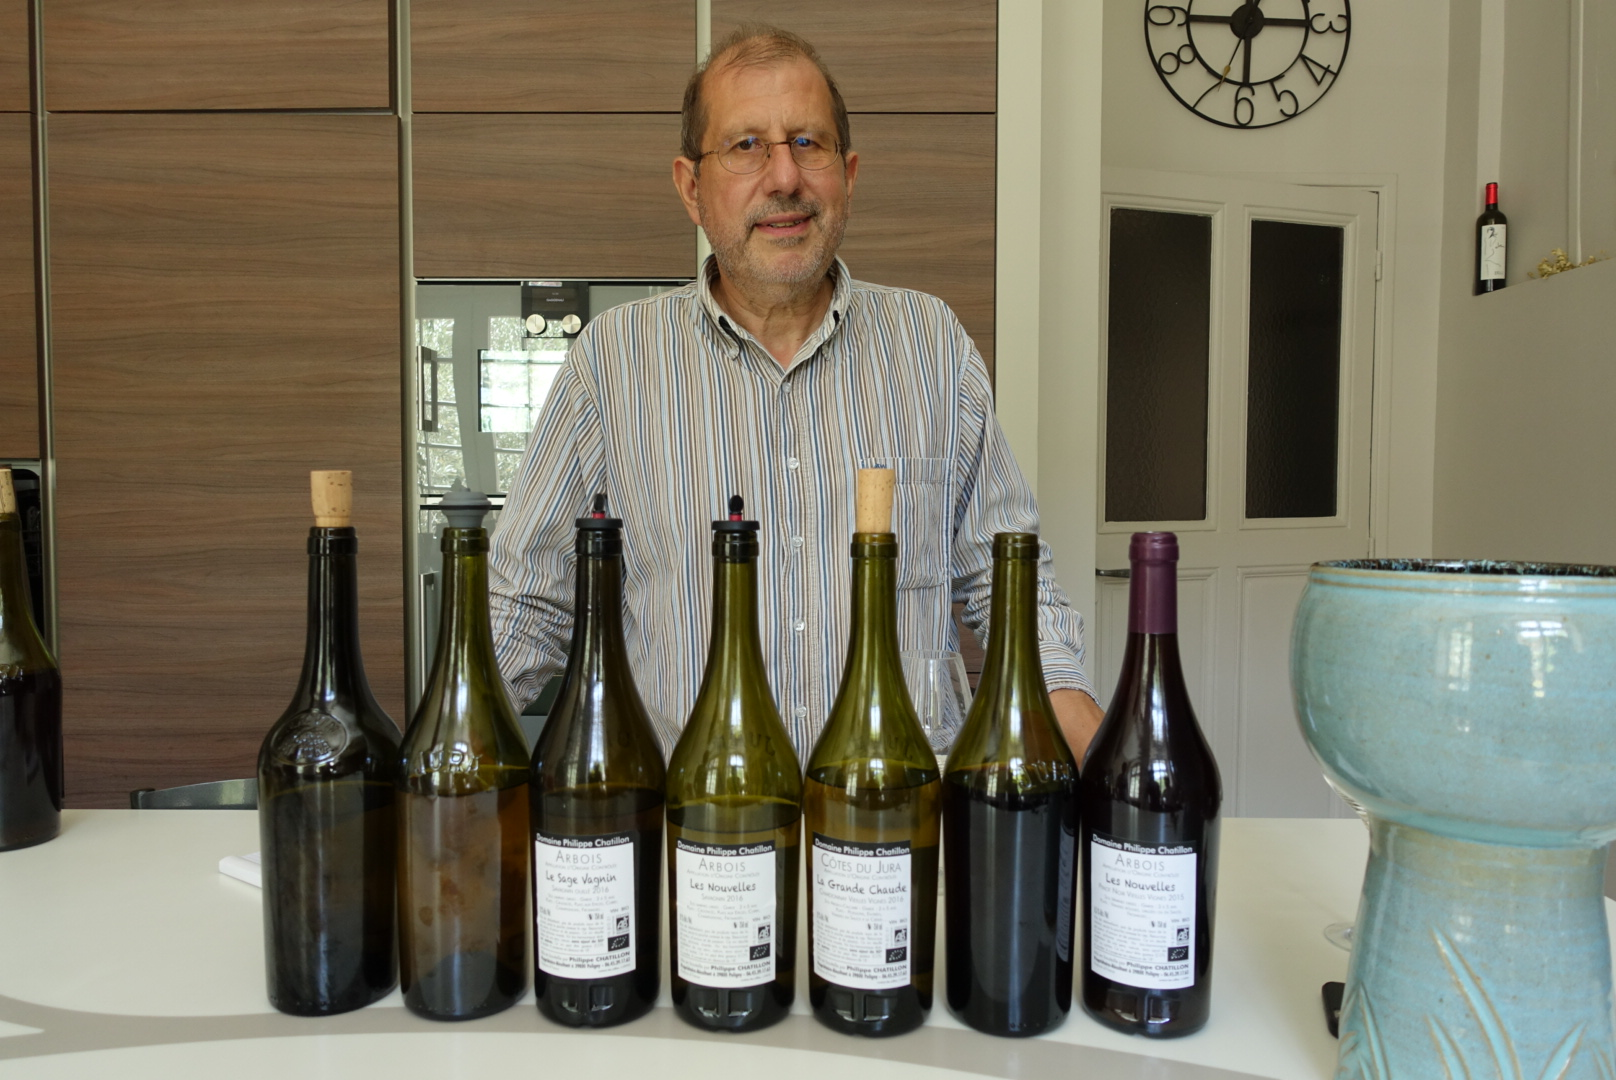 斐沙酒庄的庄主Philippe Chatillon先生